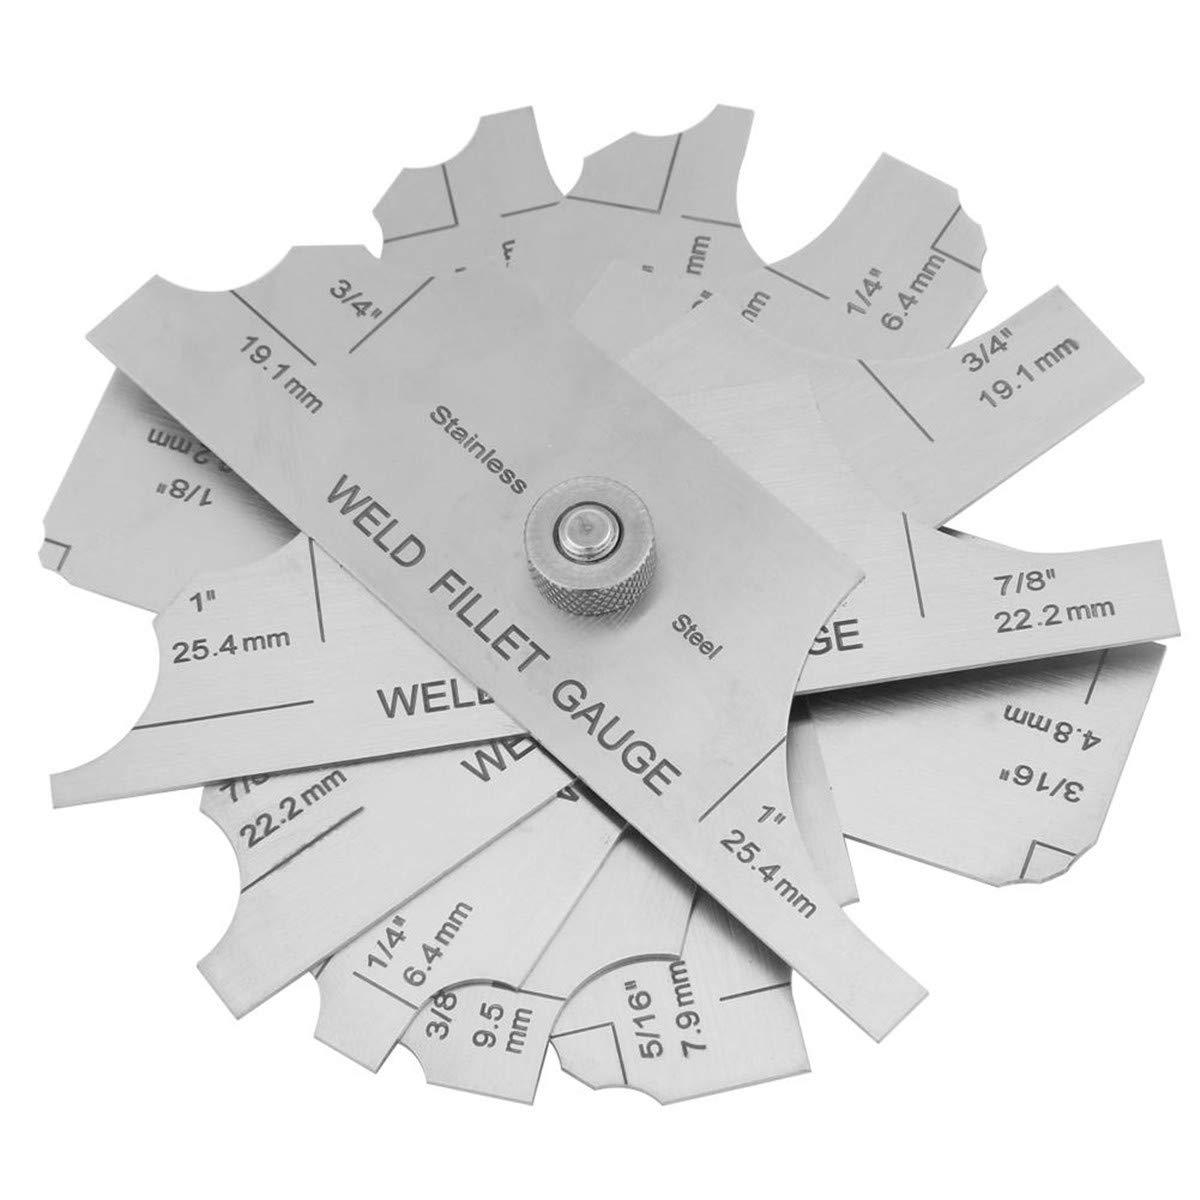 Fillet Weld Gauge Gage Set Stainless Steel Welding Inspection Gauge Inch / Metric Walfront